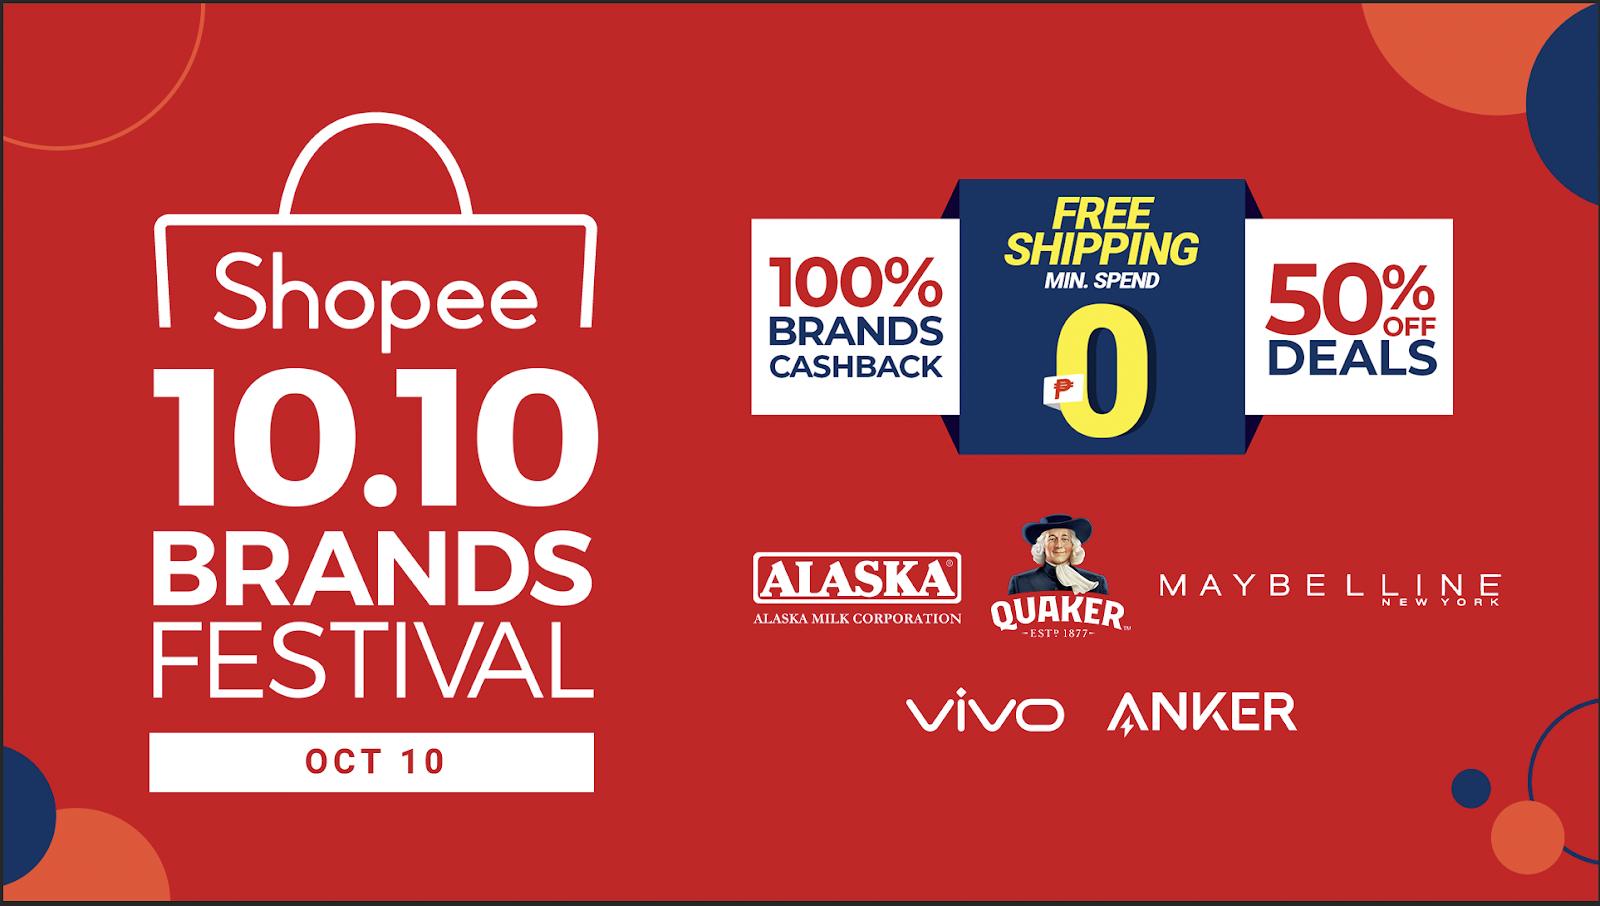 Shopee 10 10 Brands Festival Mermaid In Stilettos